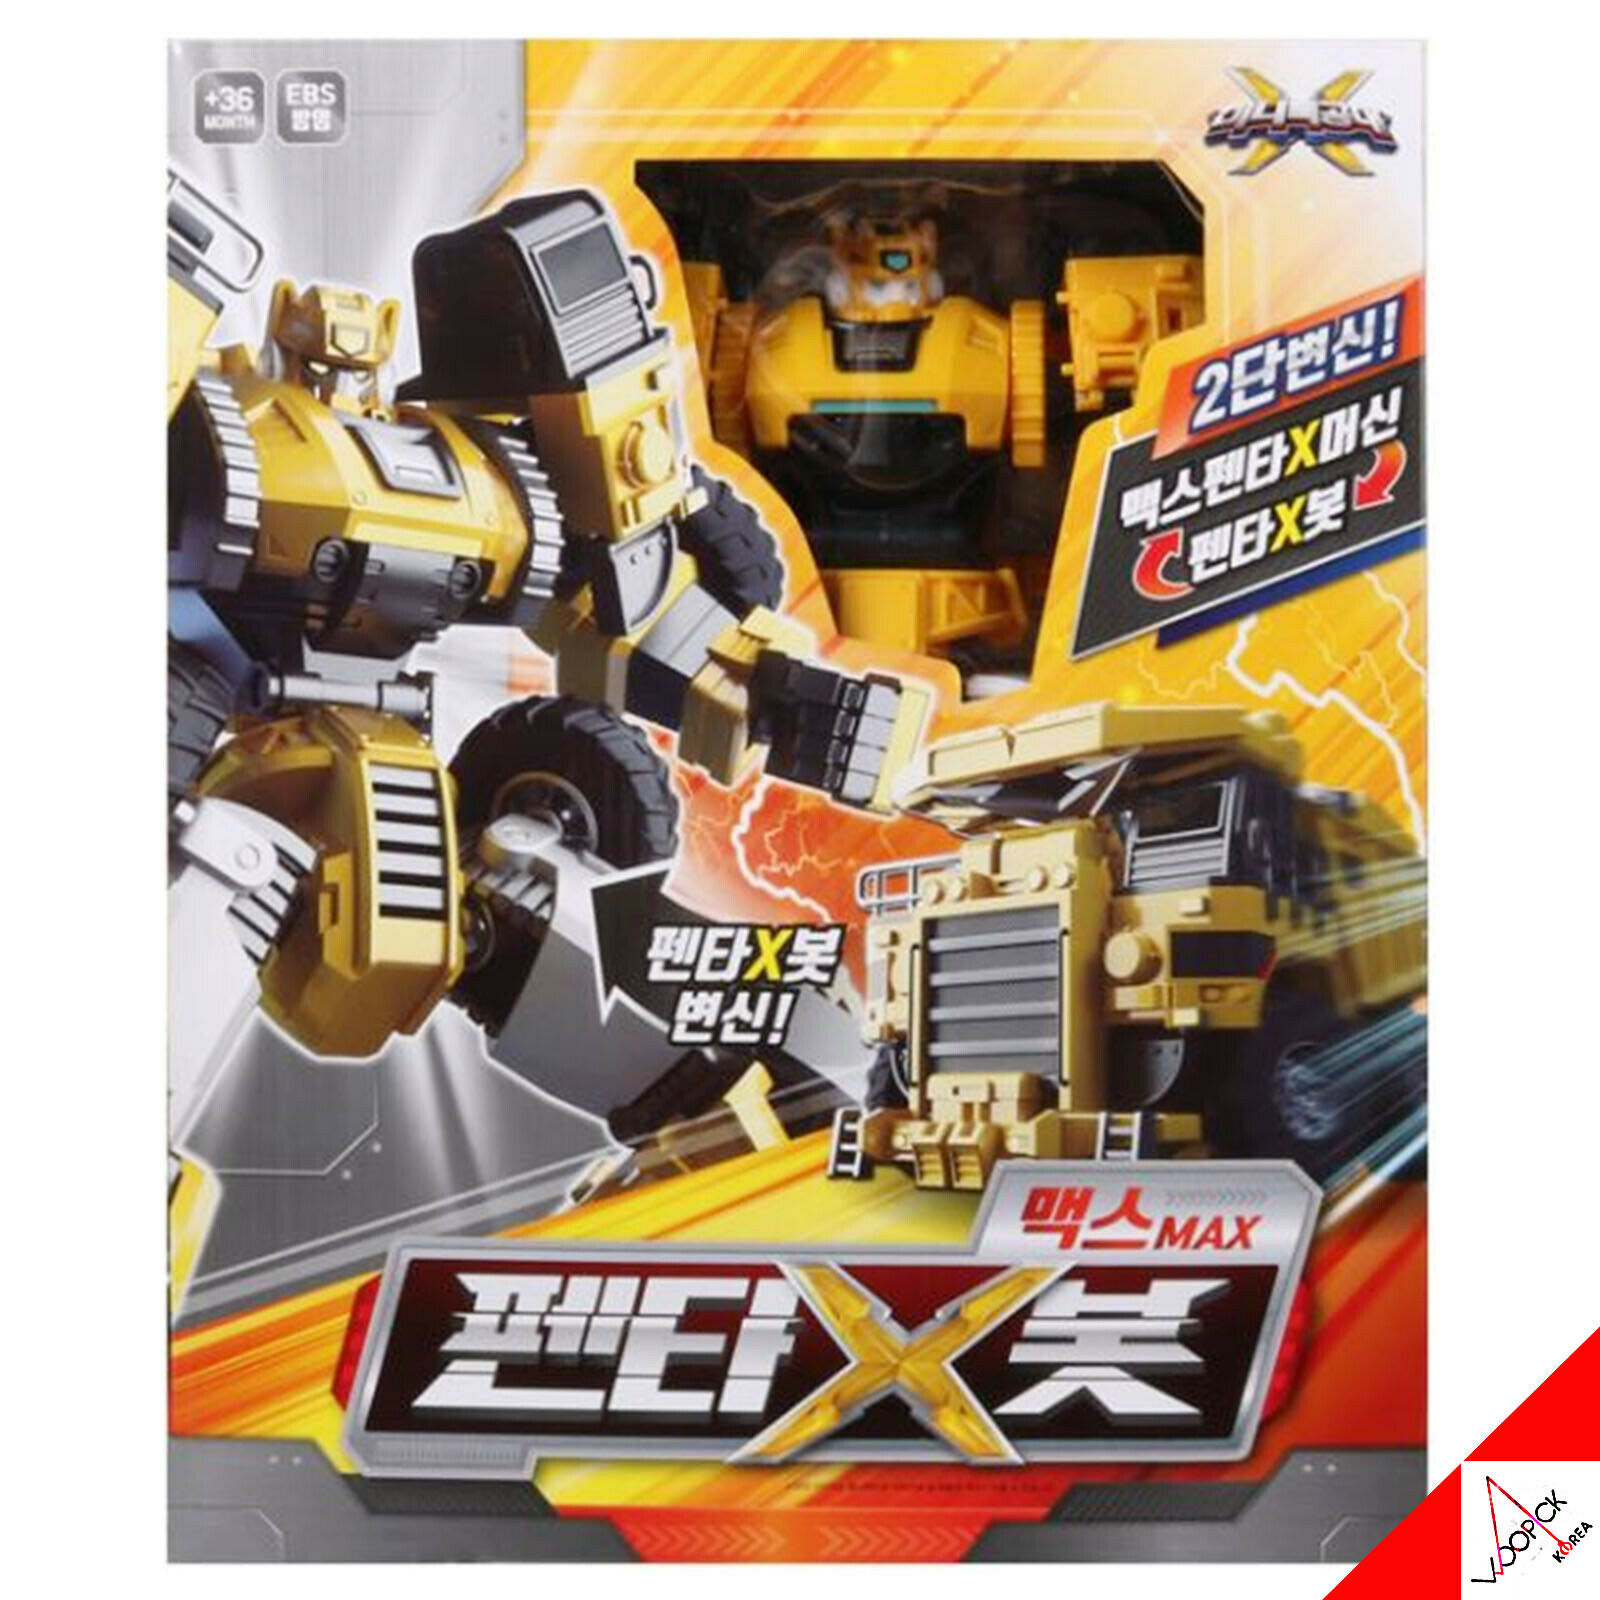 Mini Force 2019 PENTA X MAXBOT Ranger Max BOT Transformer Robot blindado Coche de juguete